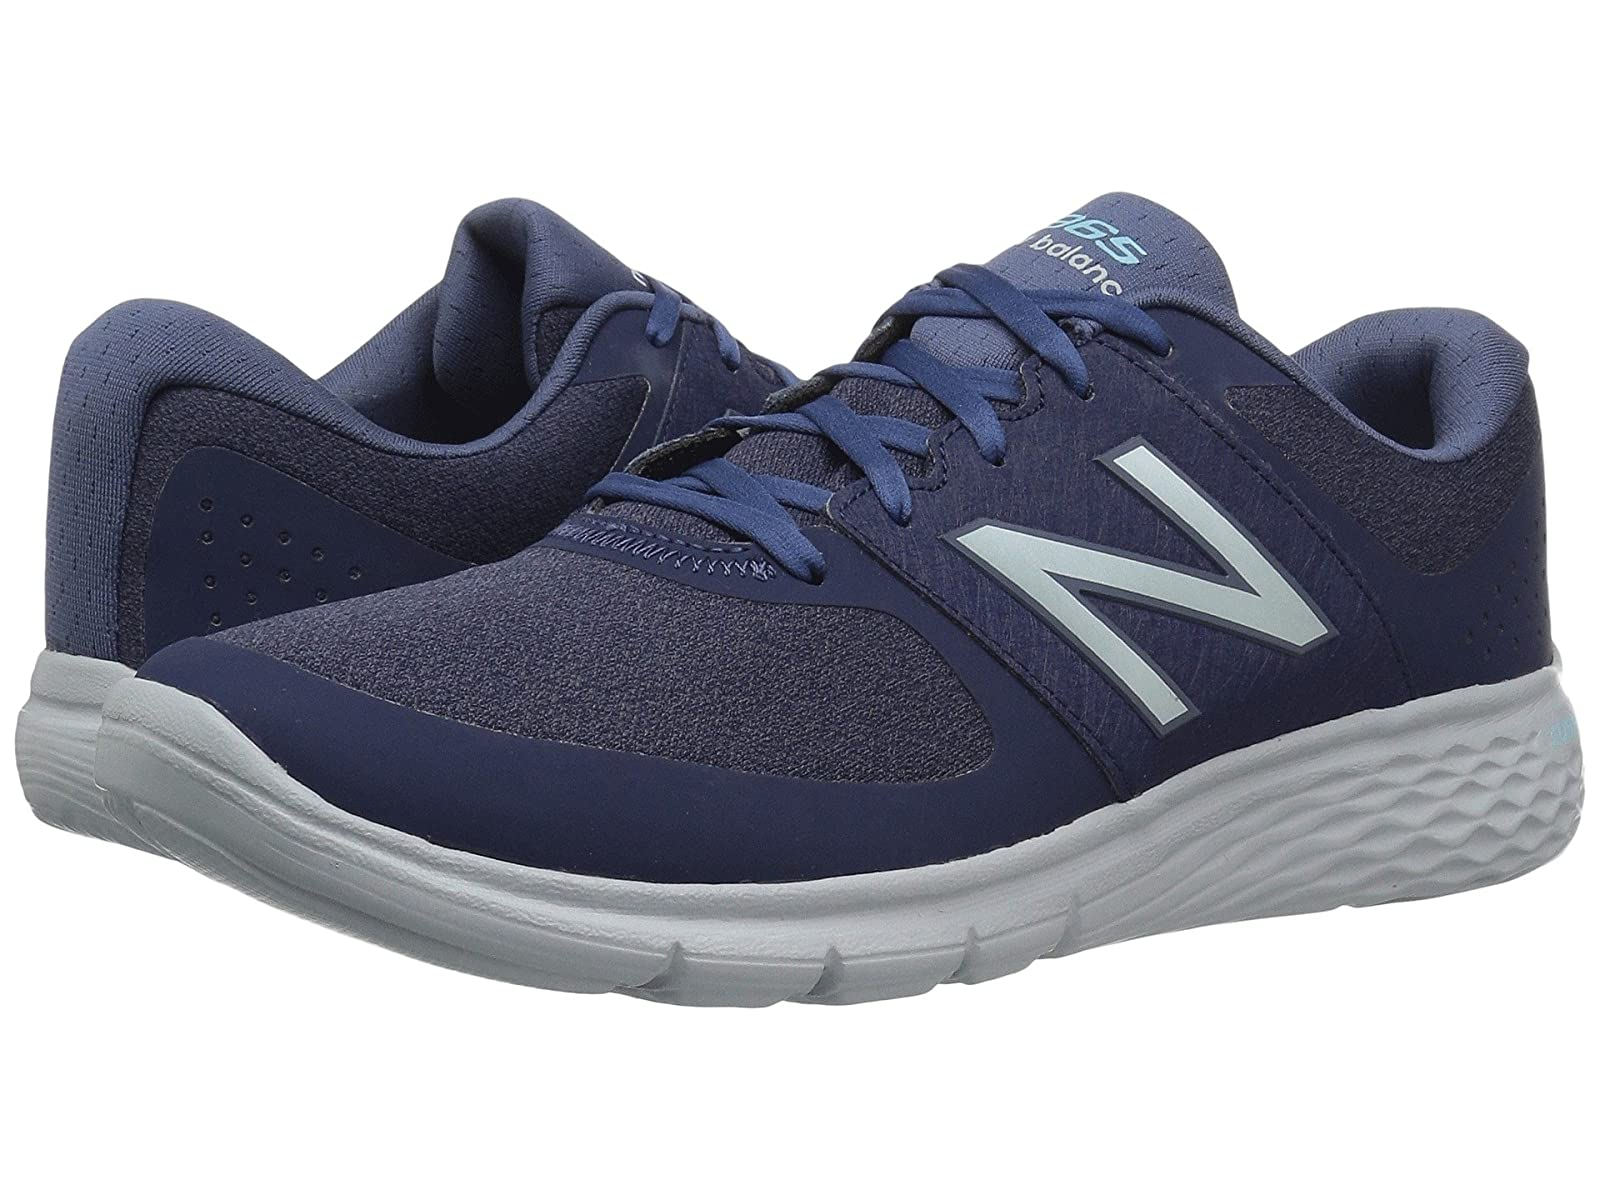 New Balance WA365v1Atmospheric grades have affordable shoes